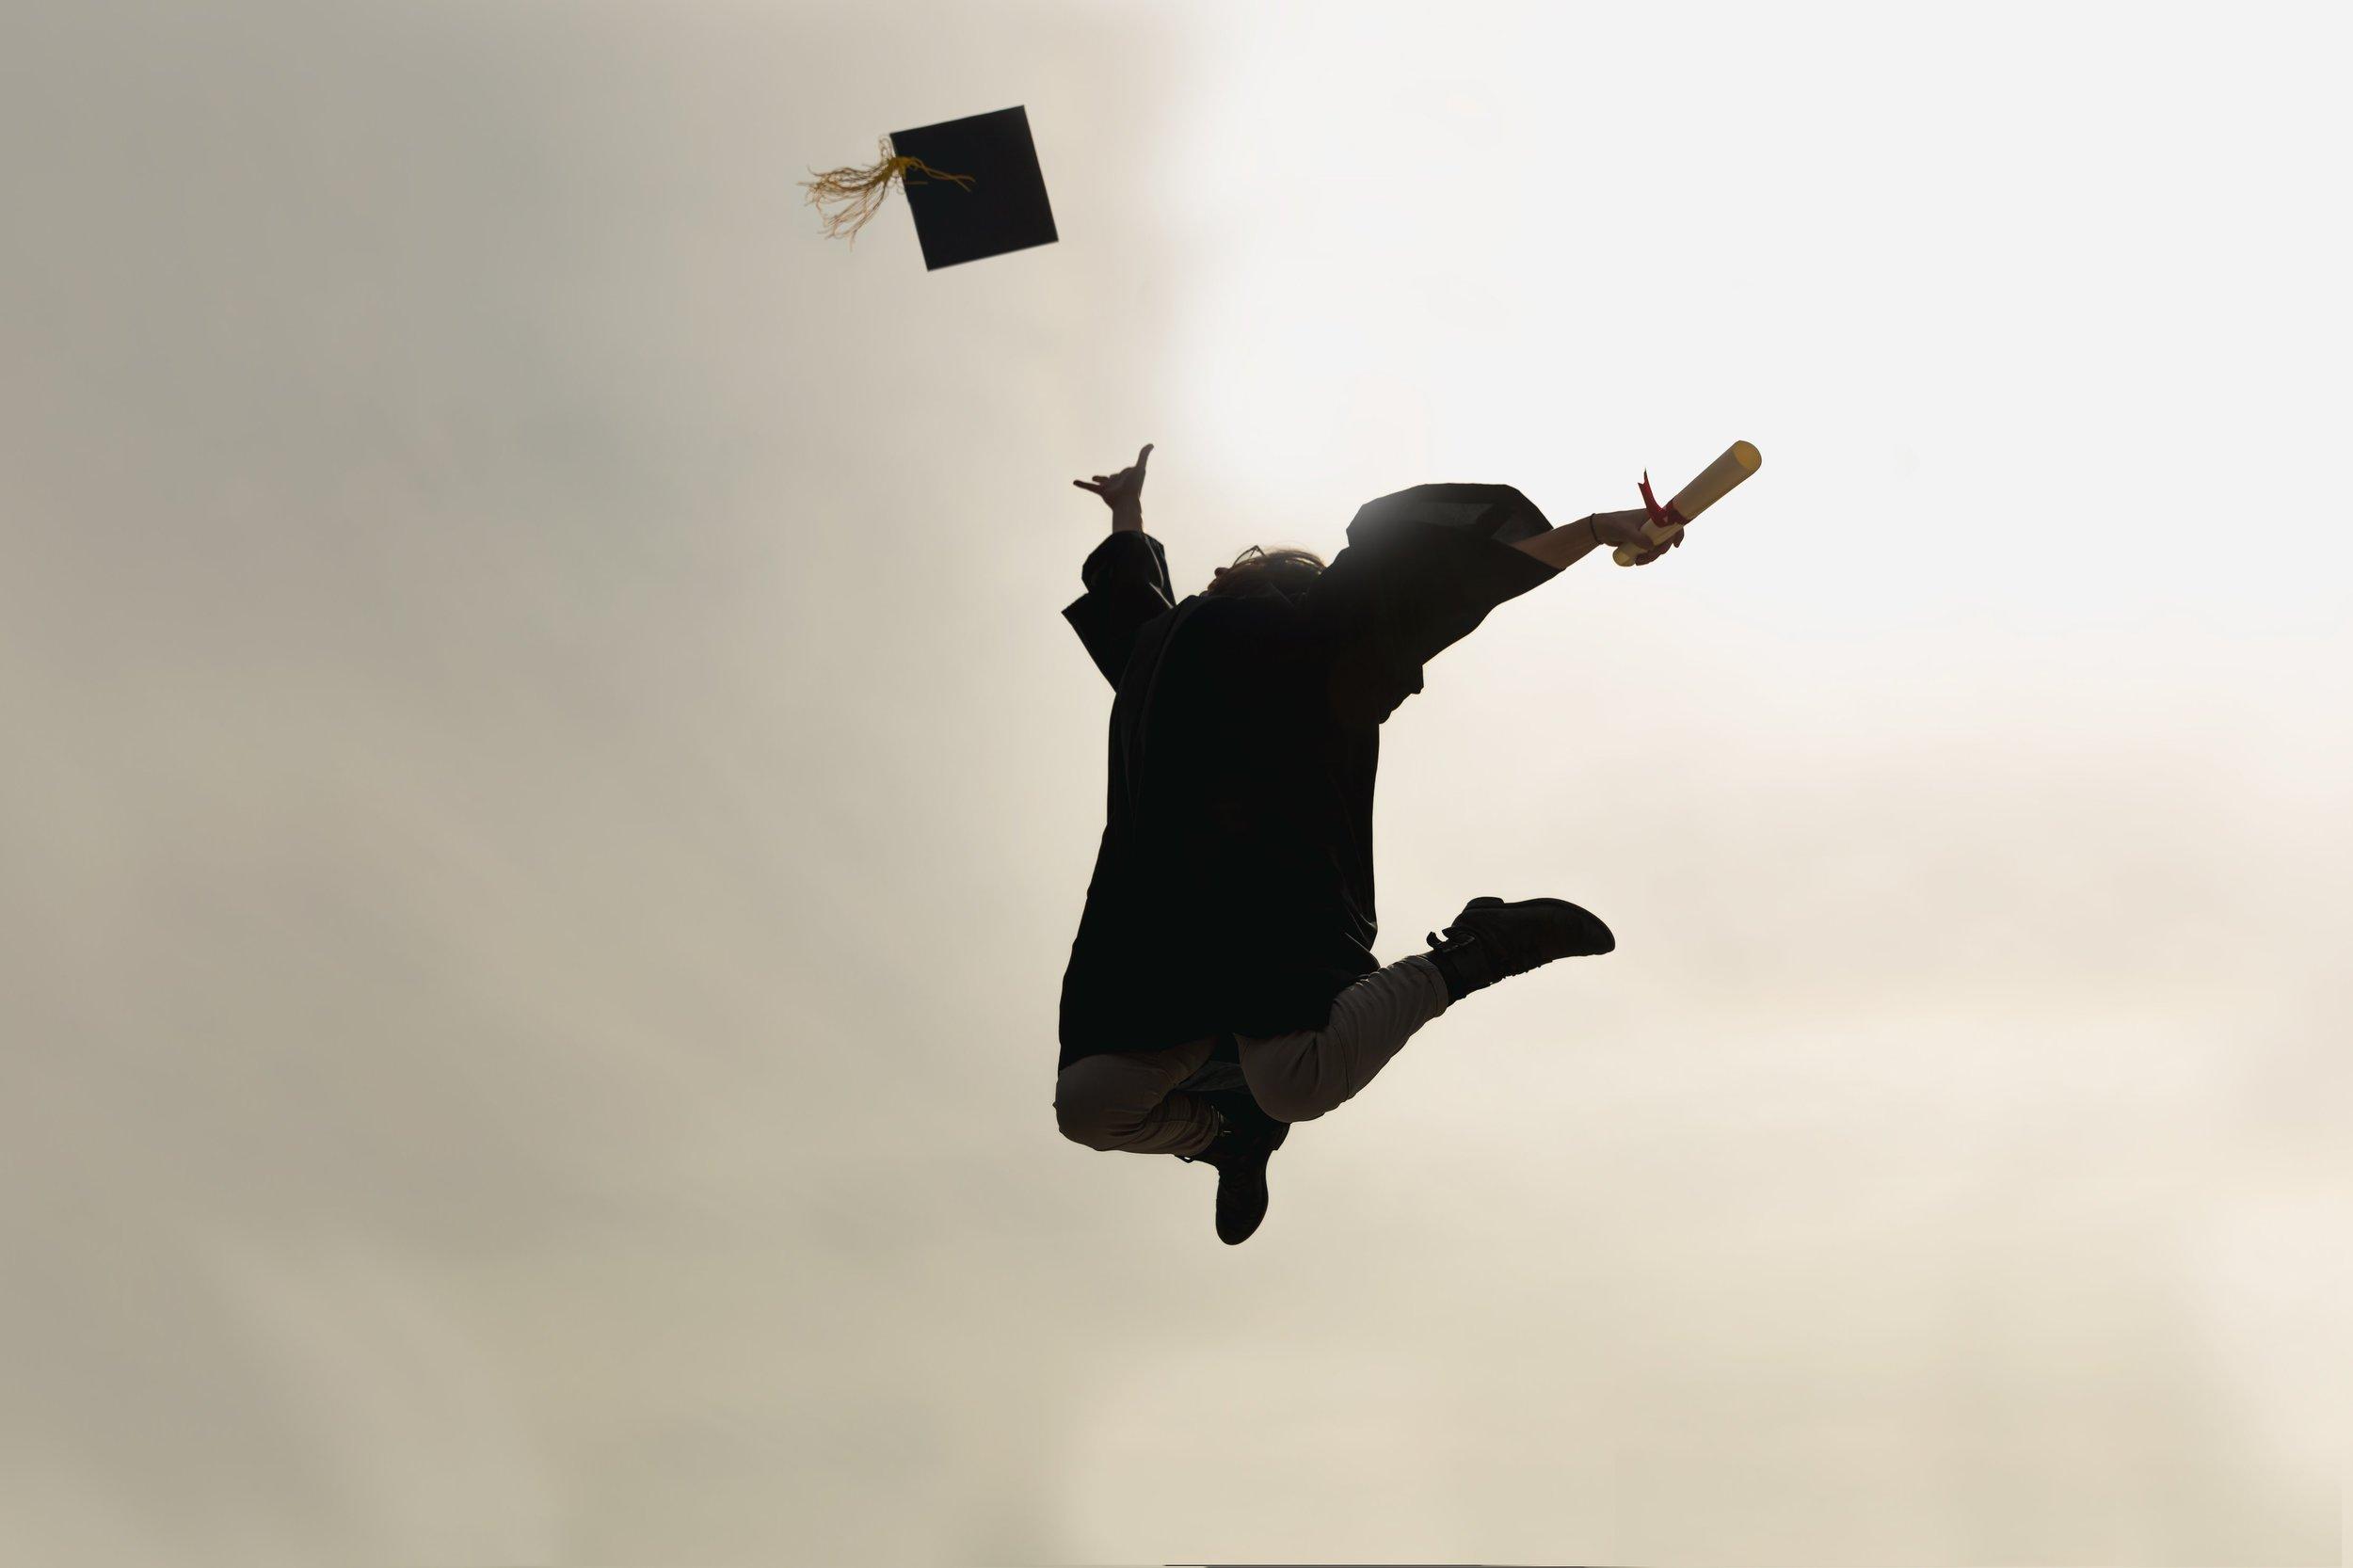 jumping-grad-student-celebrating_4460x4460.jpg